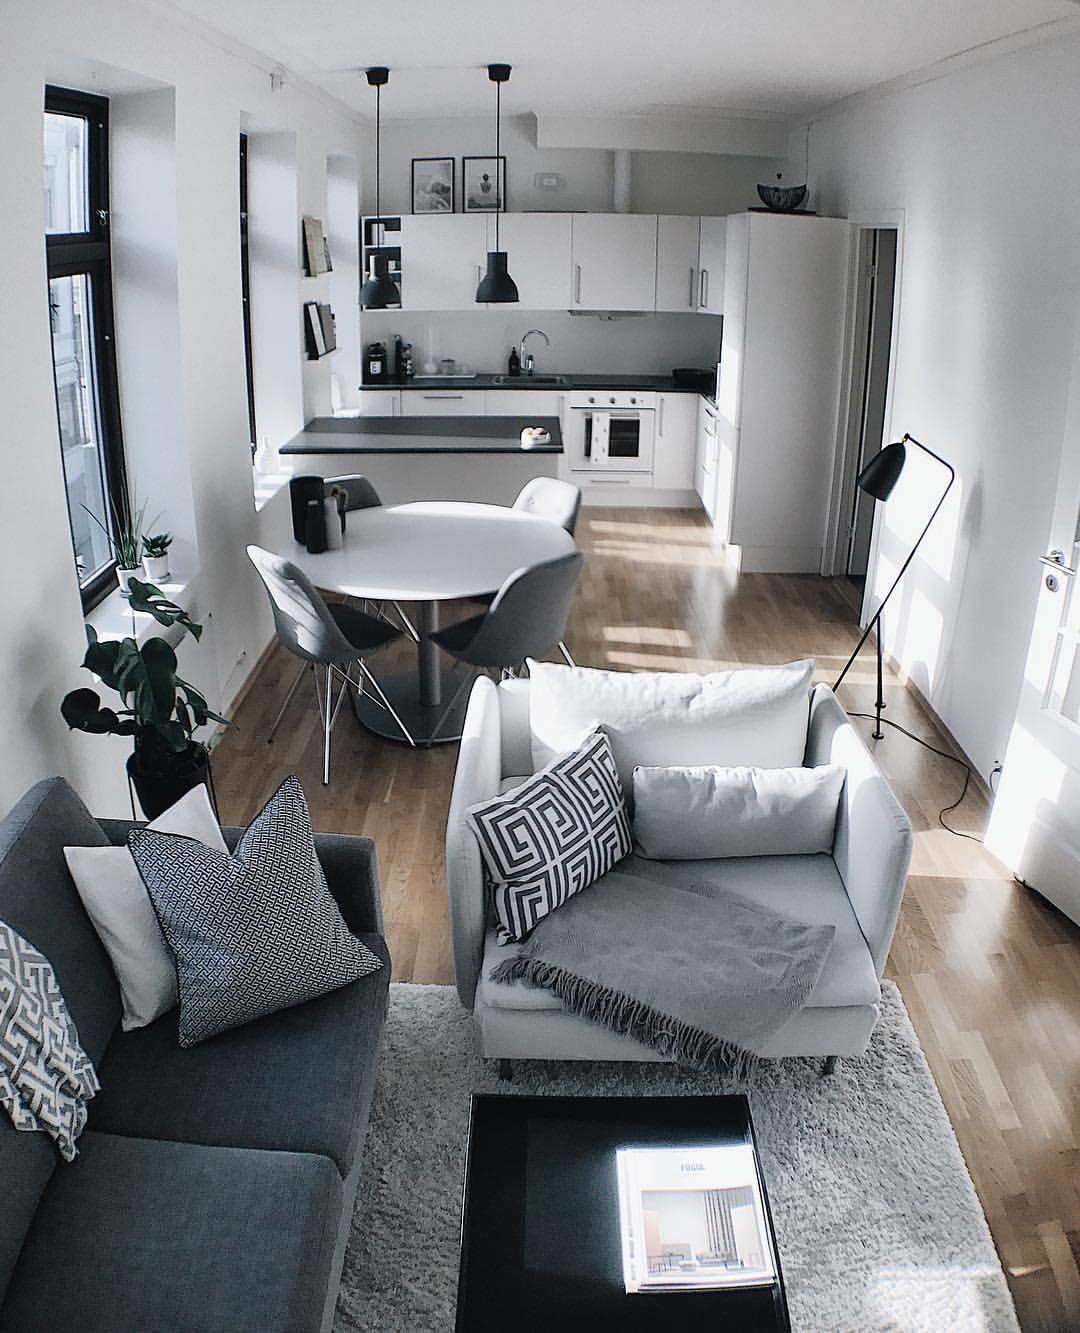 Small apartments | lovely spaces | Pinterest | Pequeños, Hogar y Salón